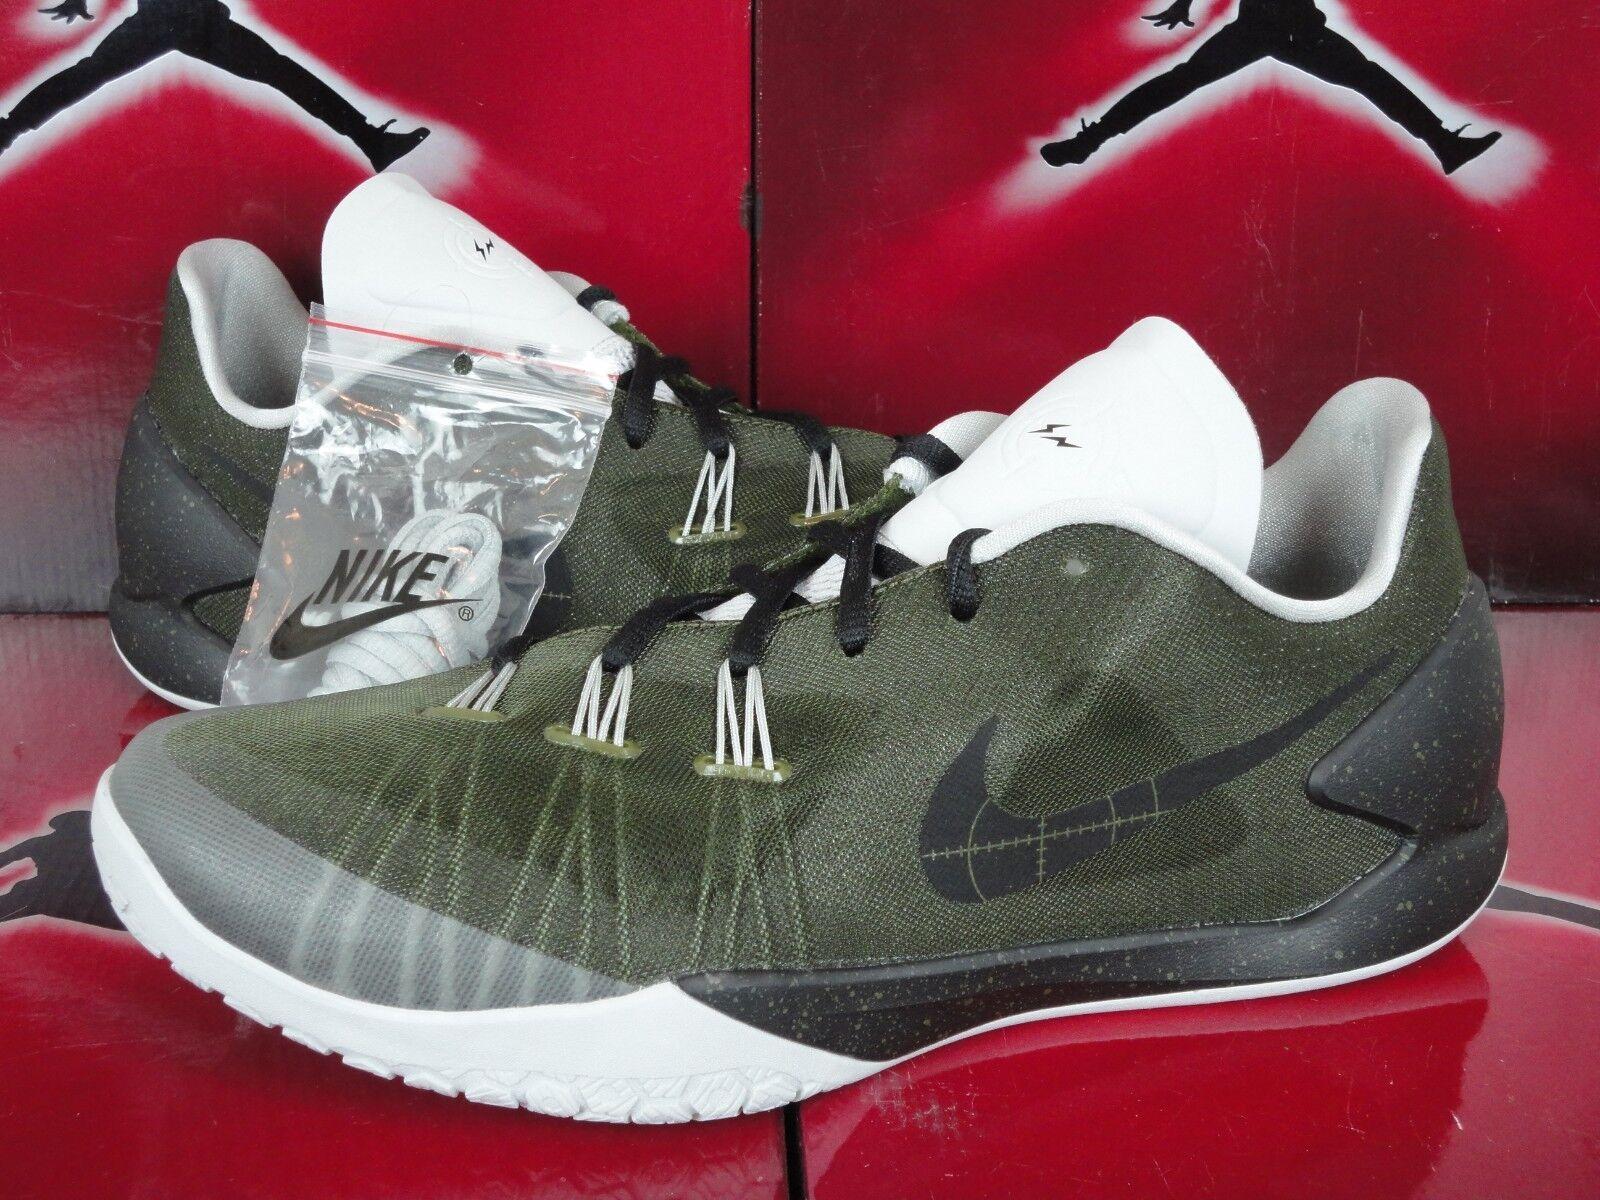 Nike Lab Hyperchase x Fragment Design SP SZ 8.5 8.5 8.5 ROUGH GREEN BLACK  789486-300 3cf8aa